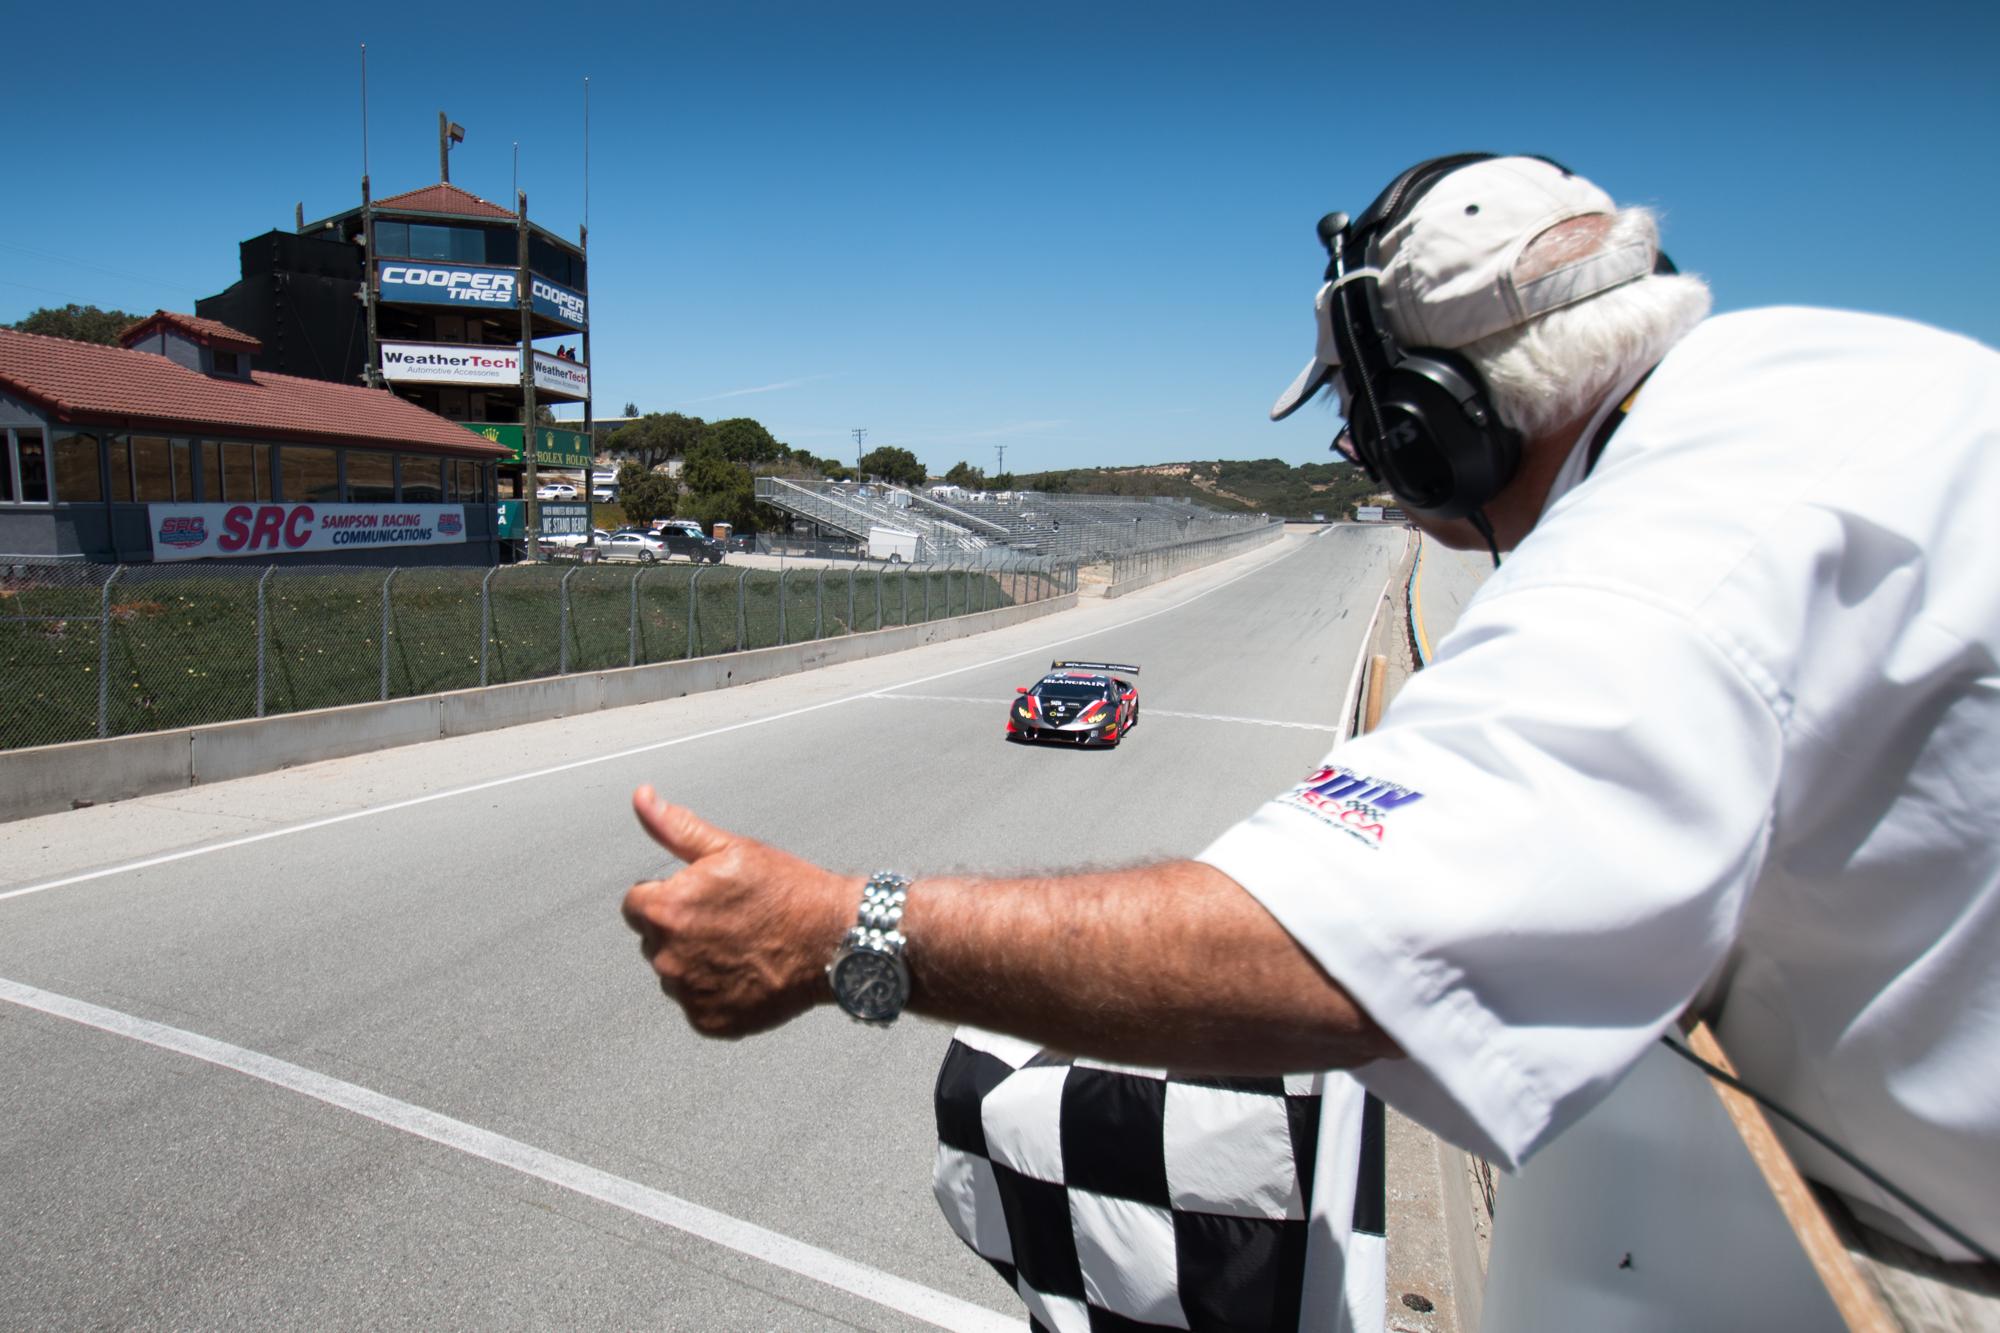 Steven-Racing-Laguna-20131004-97761.jpg